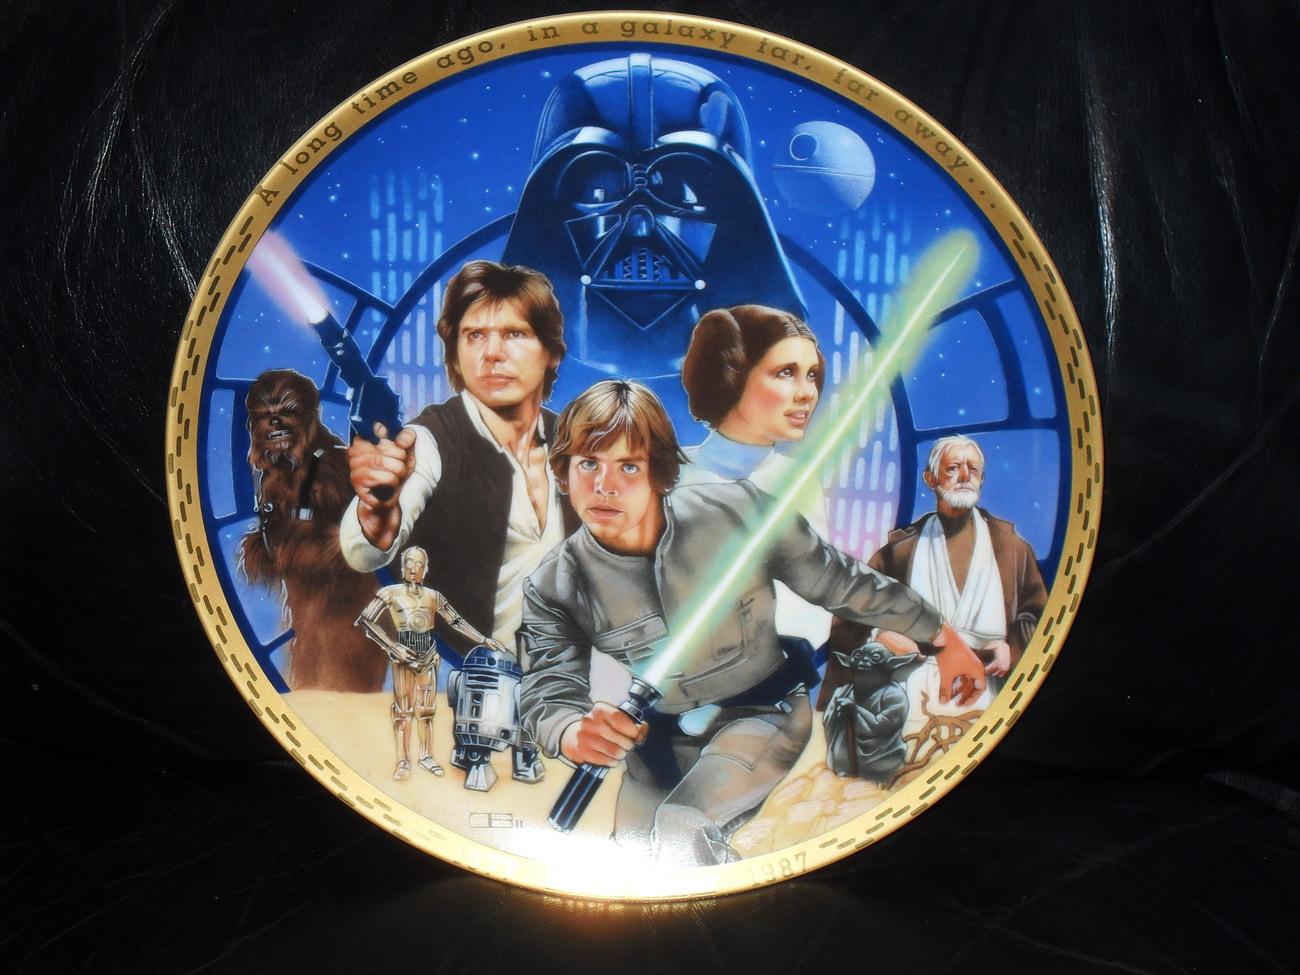 Star wars plate 002